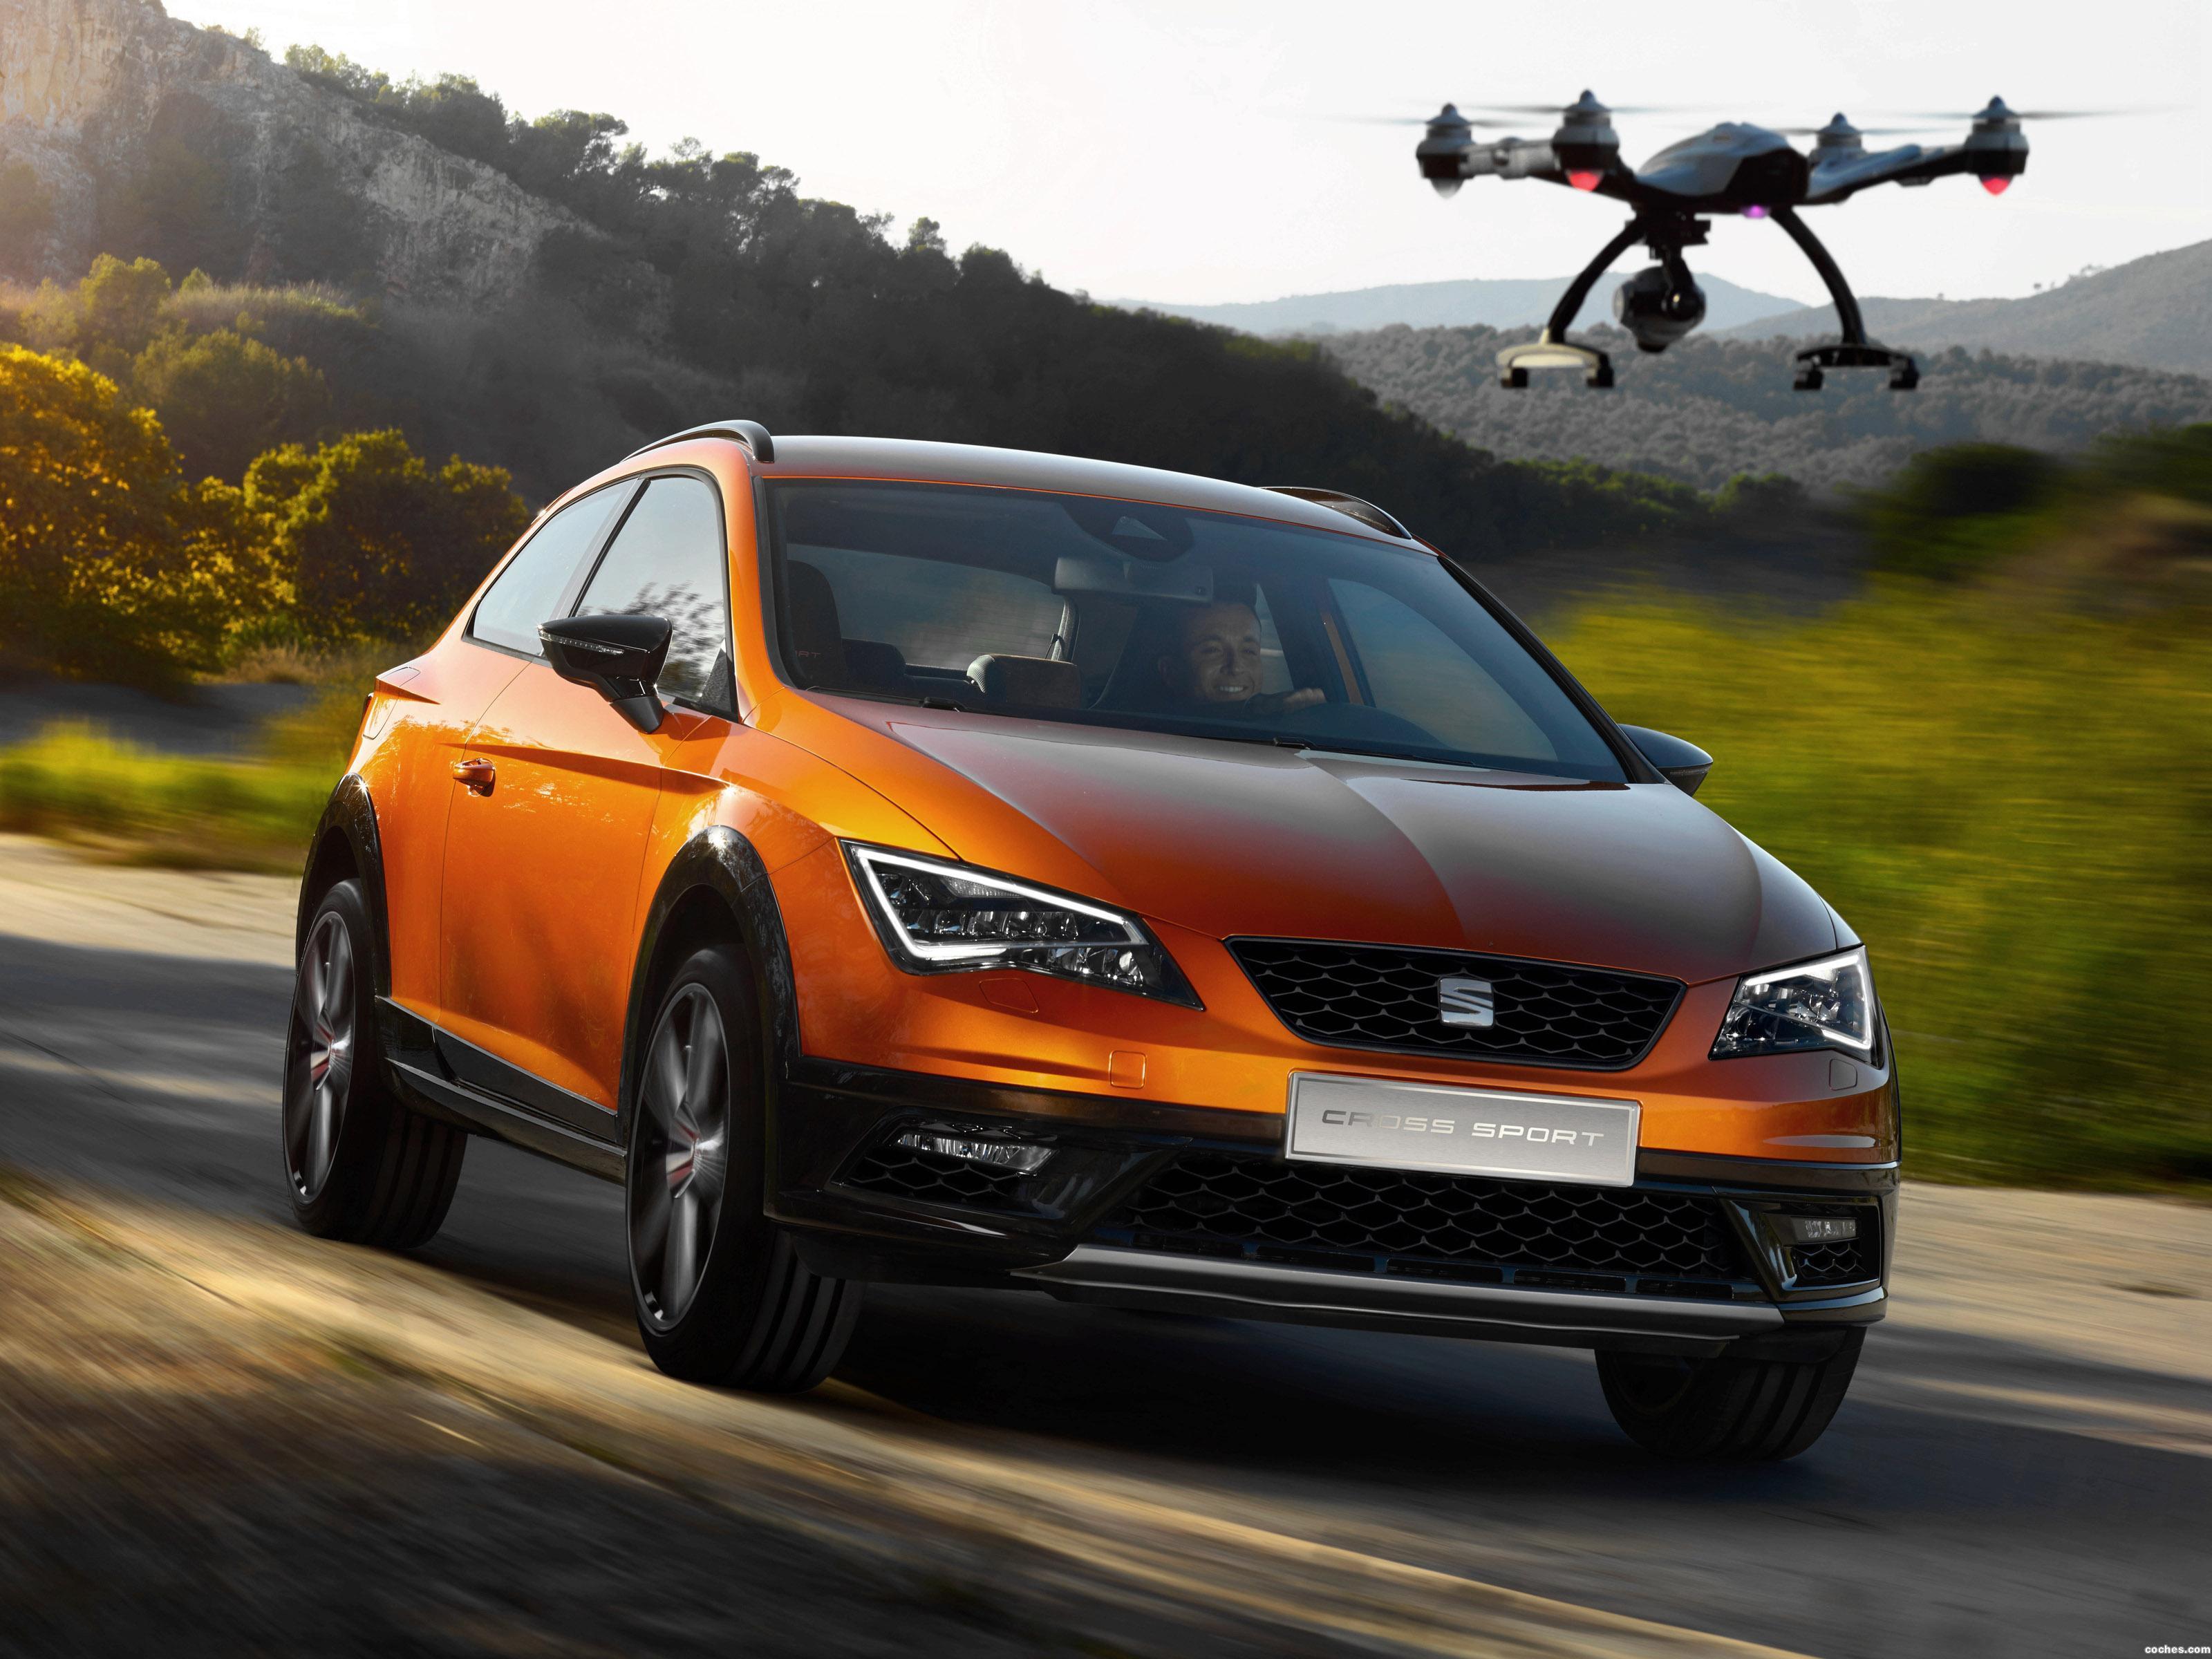 Foto 0 de Seat Leon Cross Sport Concept 2015